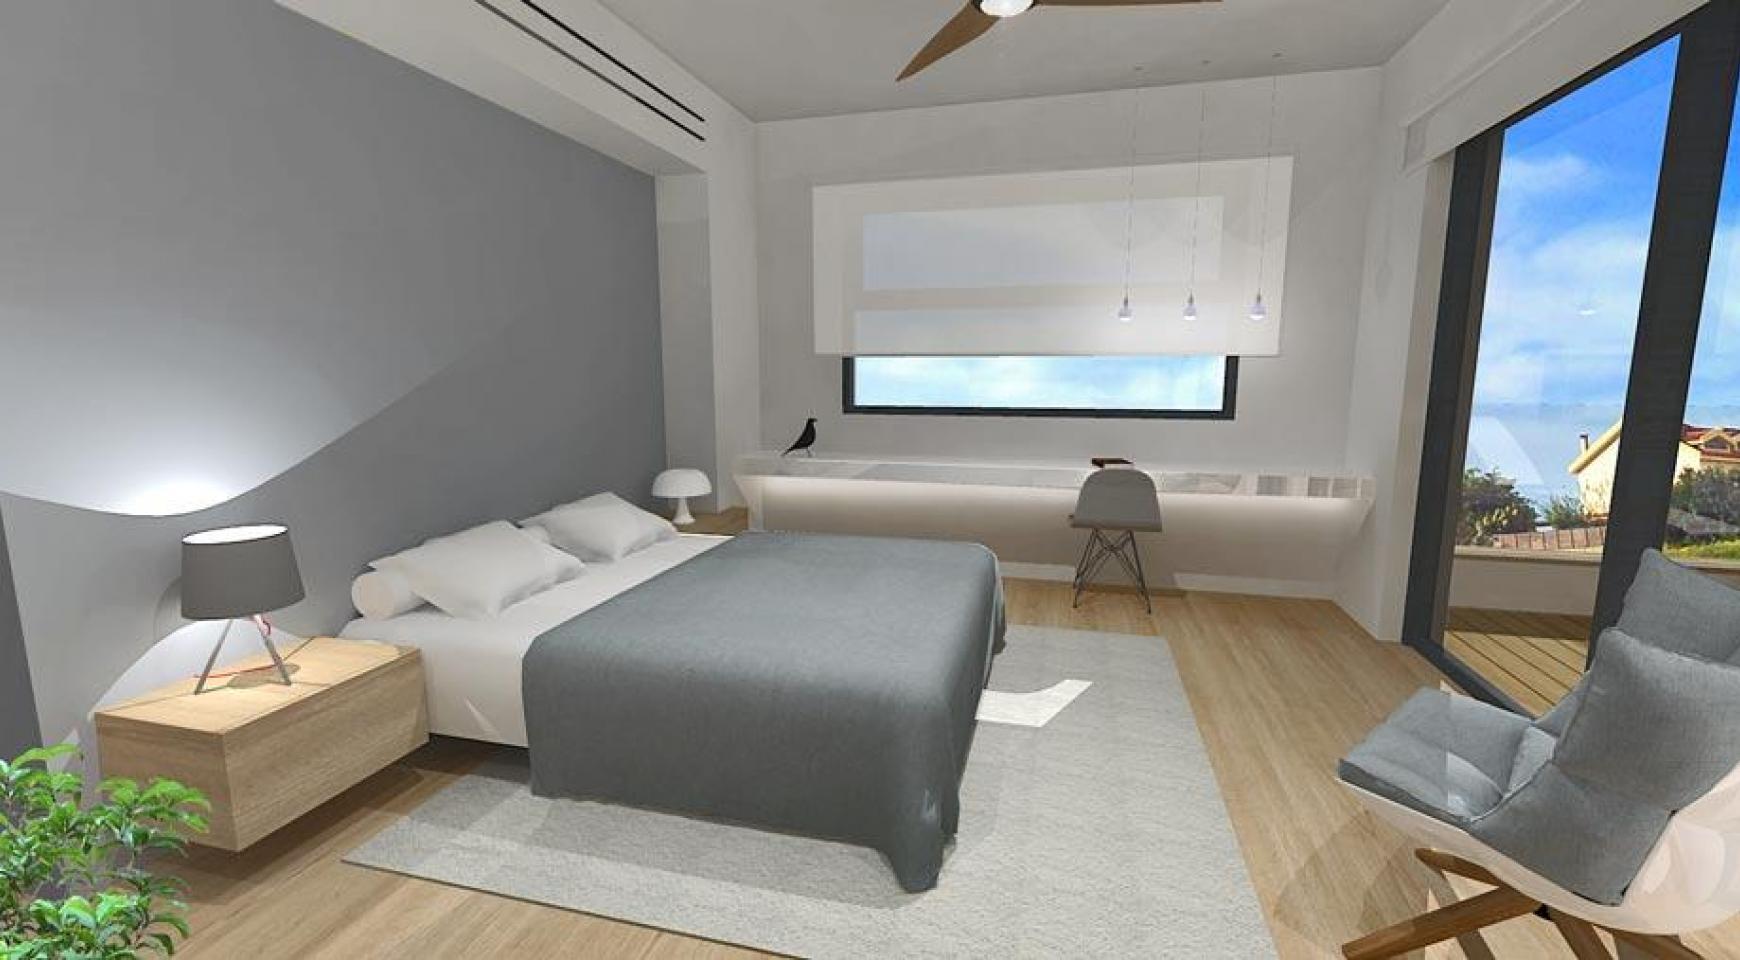 Spacious 4 Bedroom Villa in a New Complex in Agios Athanasios - 10